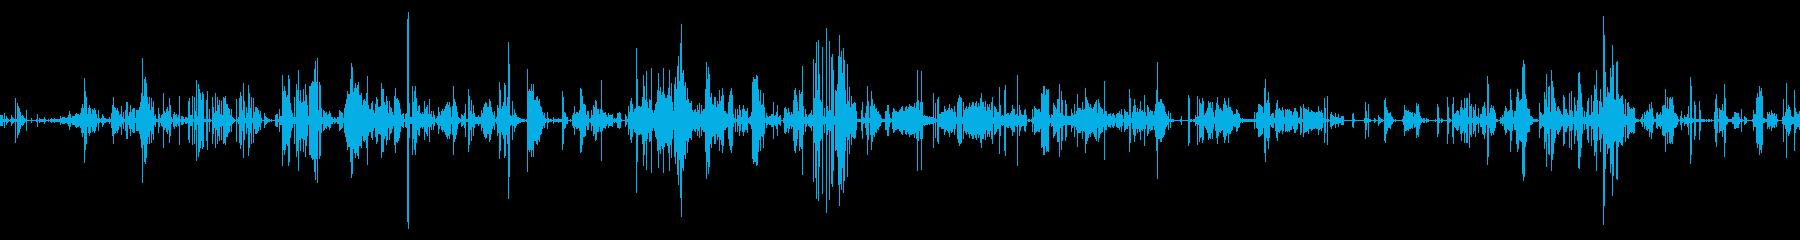 SCI FIクリーチャー:食べるク...の再生済みの波形